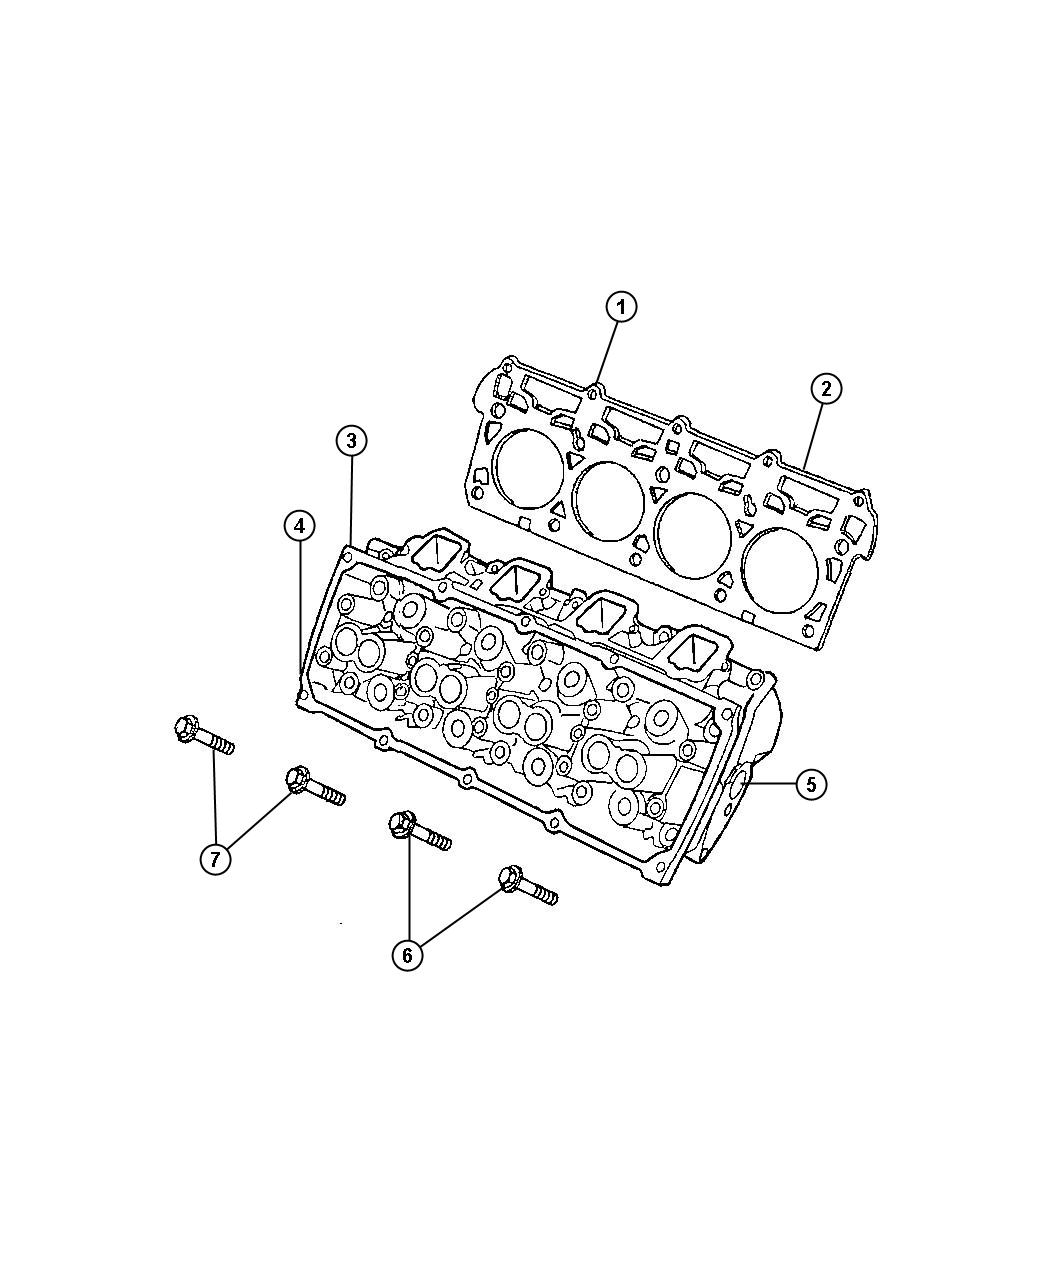 6 4 Hemi Crate Engine